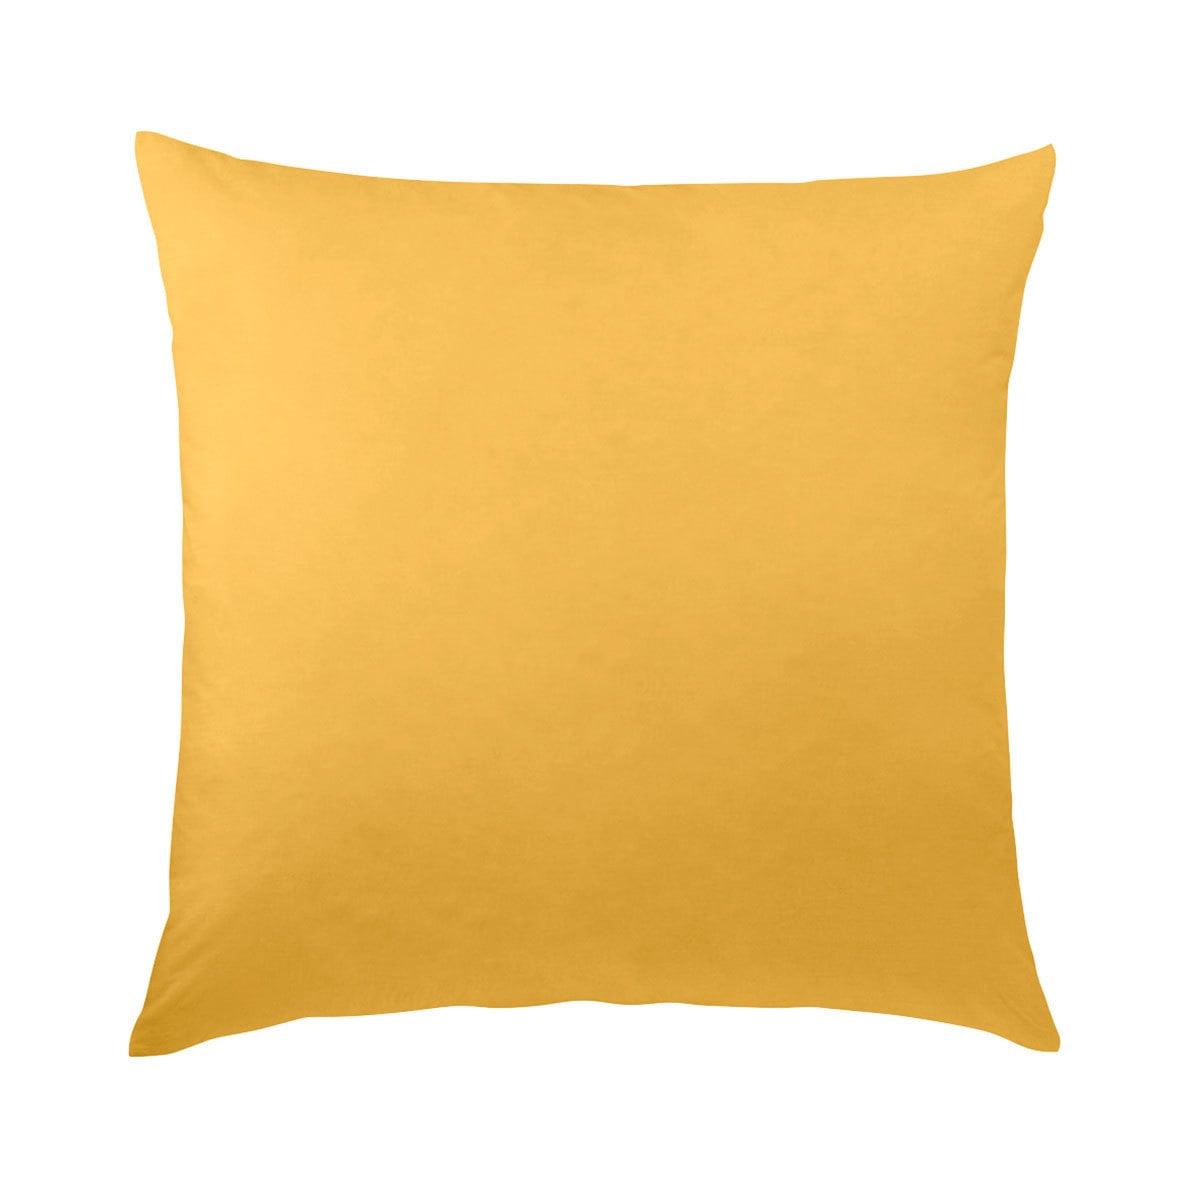 bettwarenshop uni biber kissenbezug g nstig online kaufen bei bettwaren shop. Black Bedroom Furniture Sets. Home Design Ideas